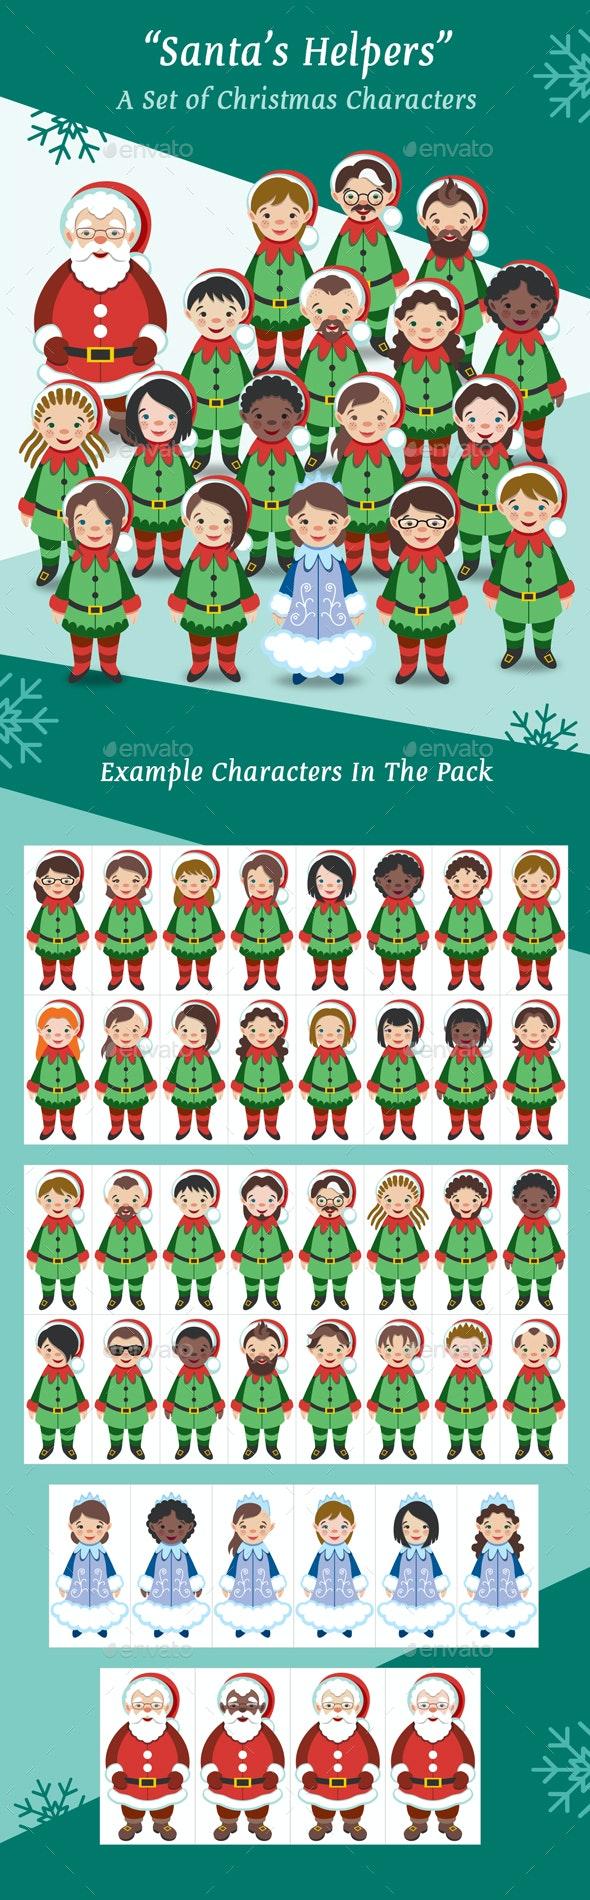 Santa's Helpers - A Set of Christmas Characters - Characters Vectors